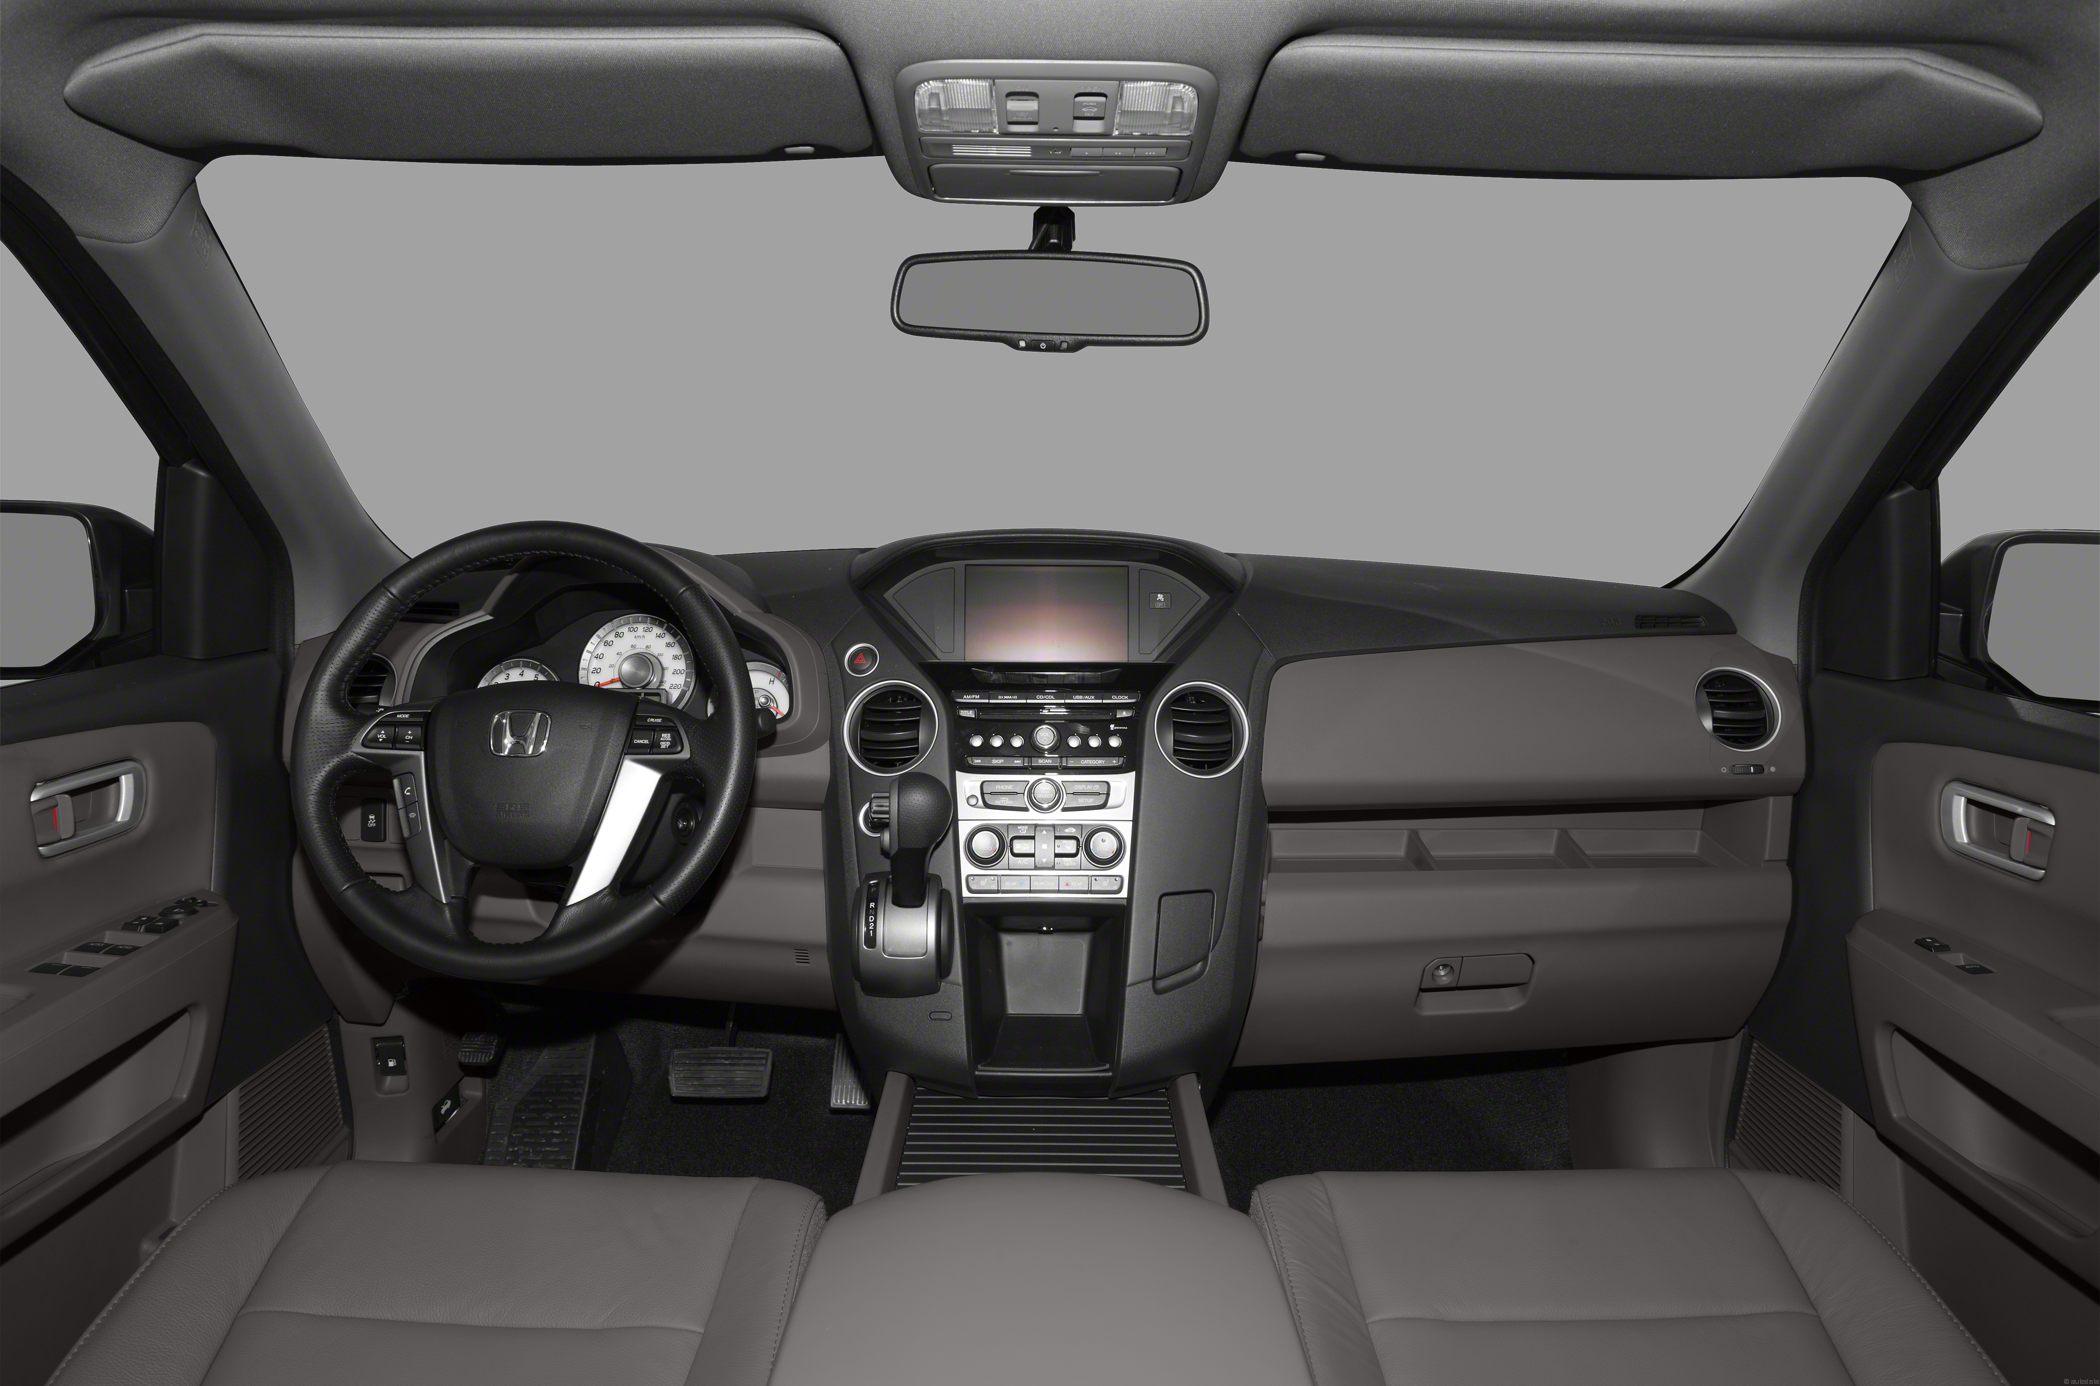 2012 Honda Pilot Image 18